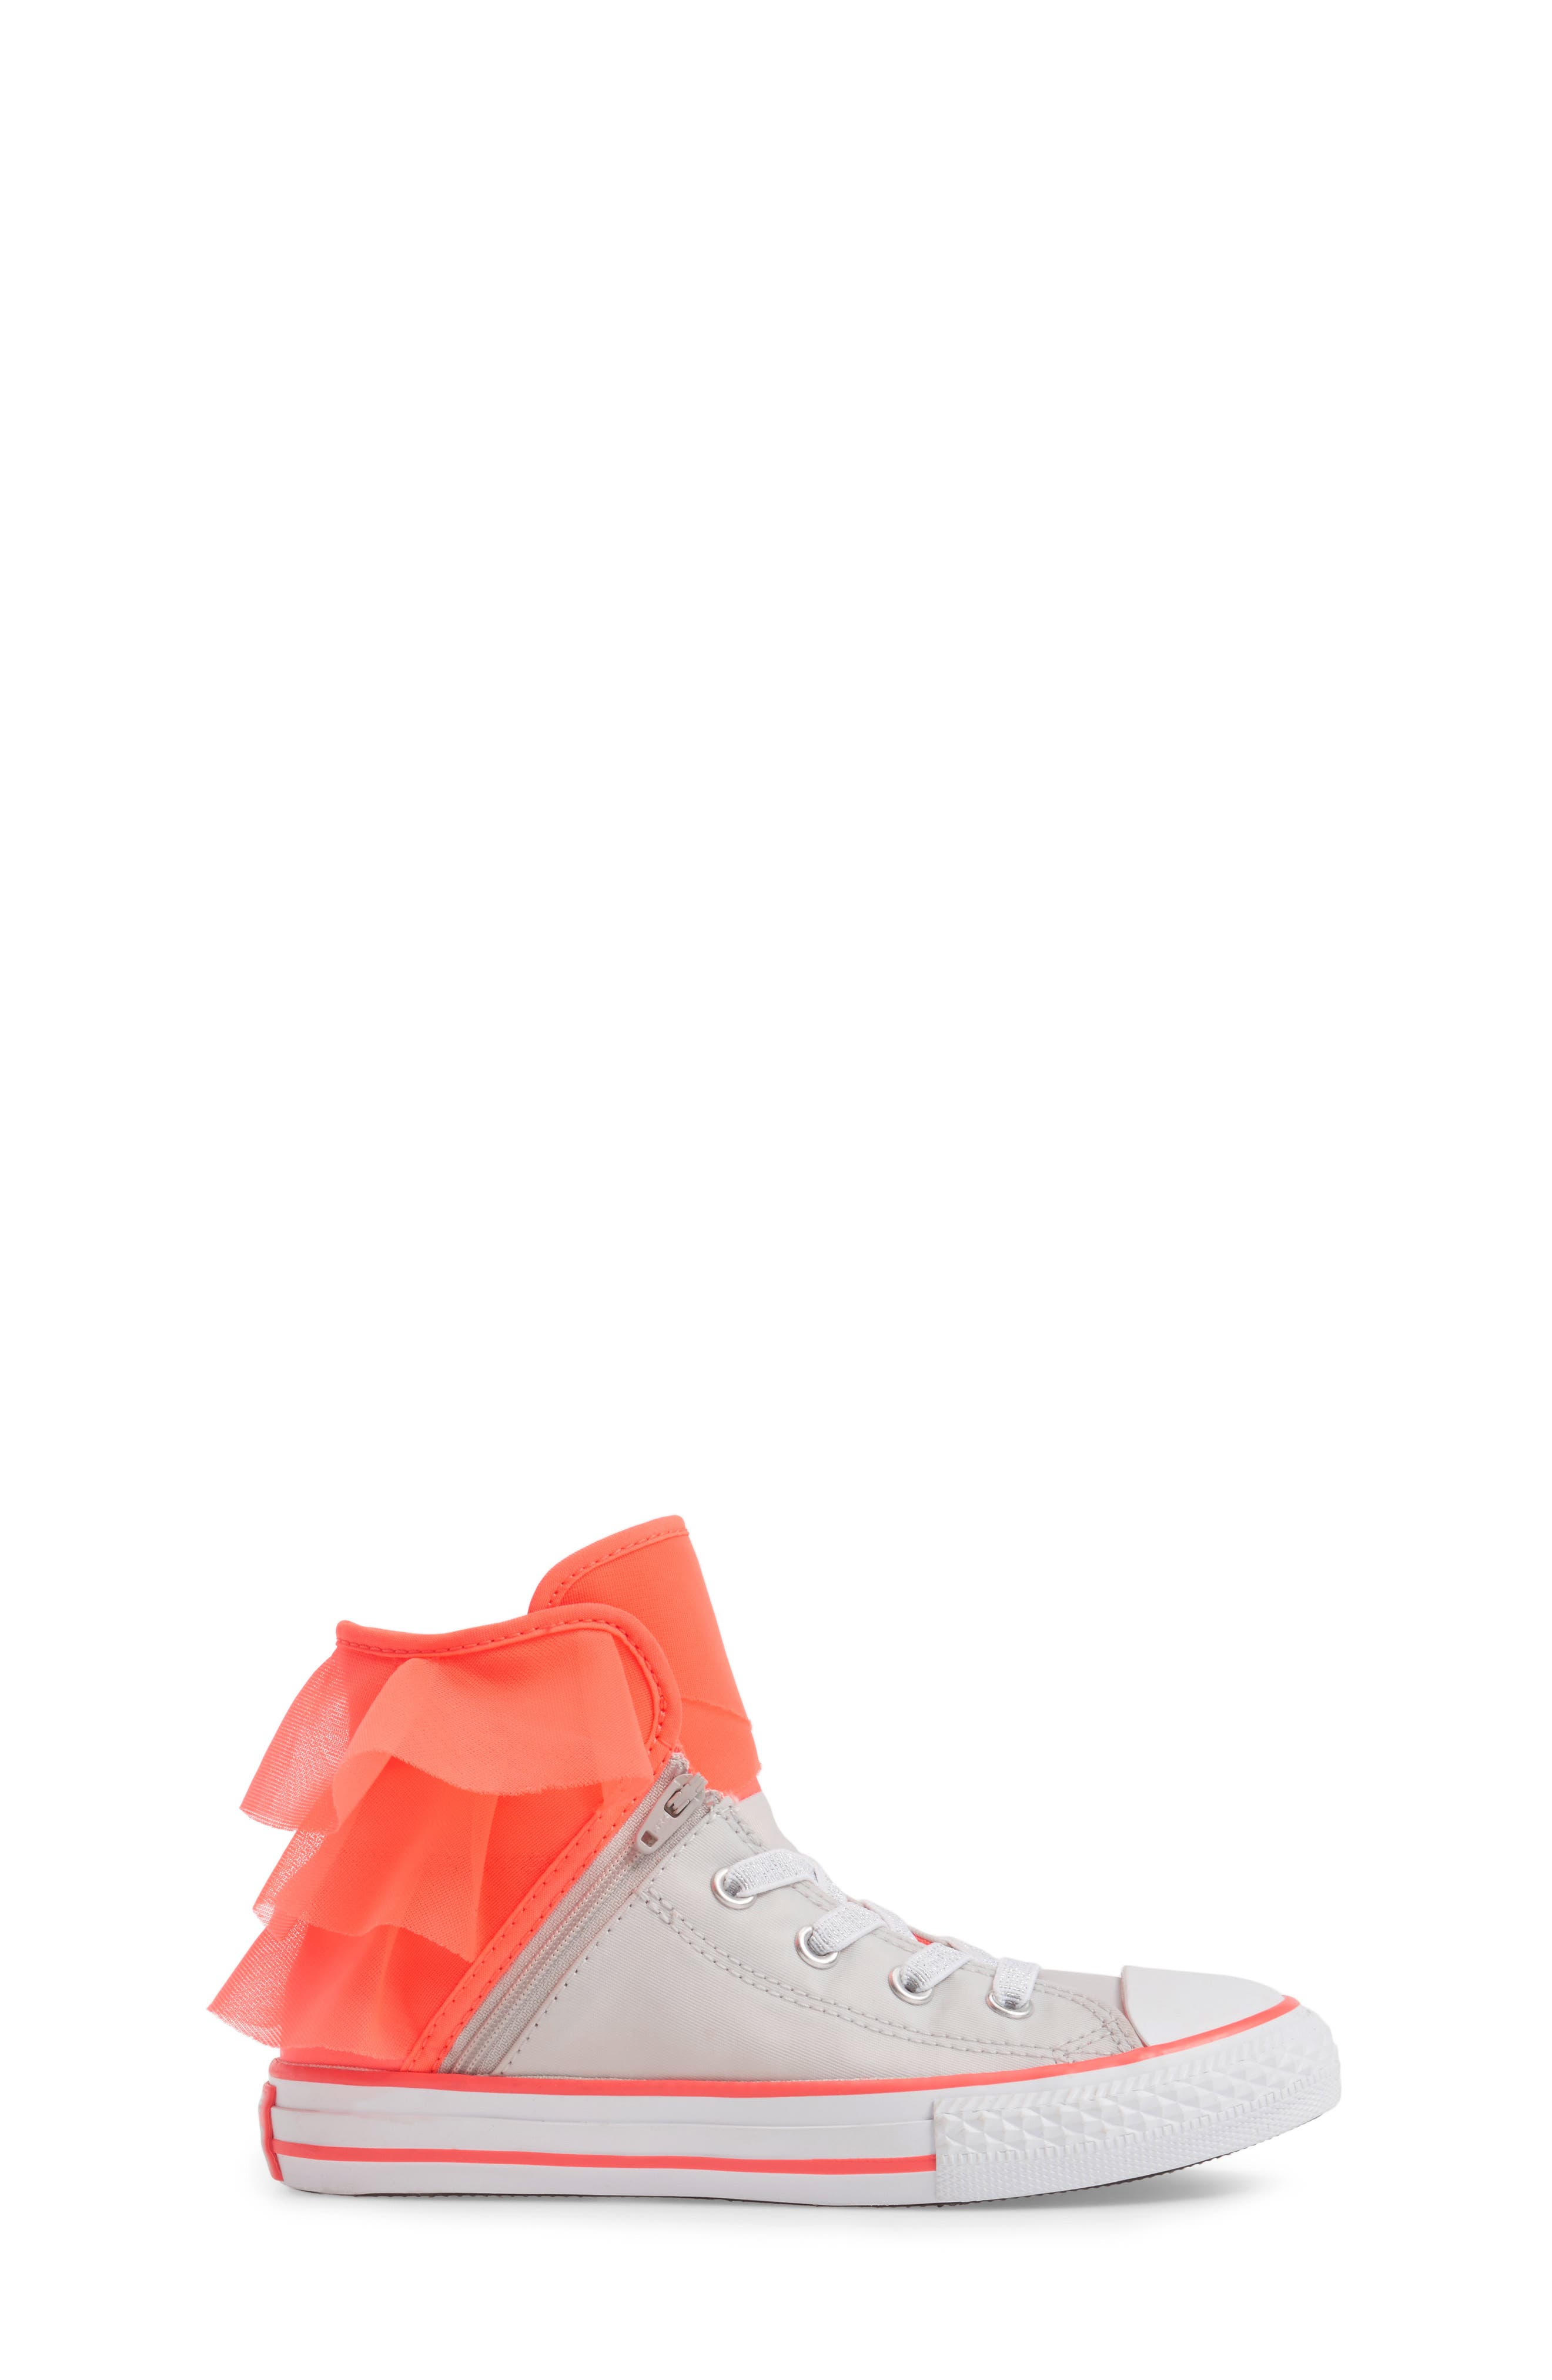 Alternate Image 3  - Converse Block Party High Top Sneaker (Baby, Walker, Toddler, Little Kid & Big Kid)